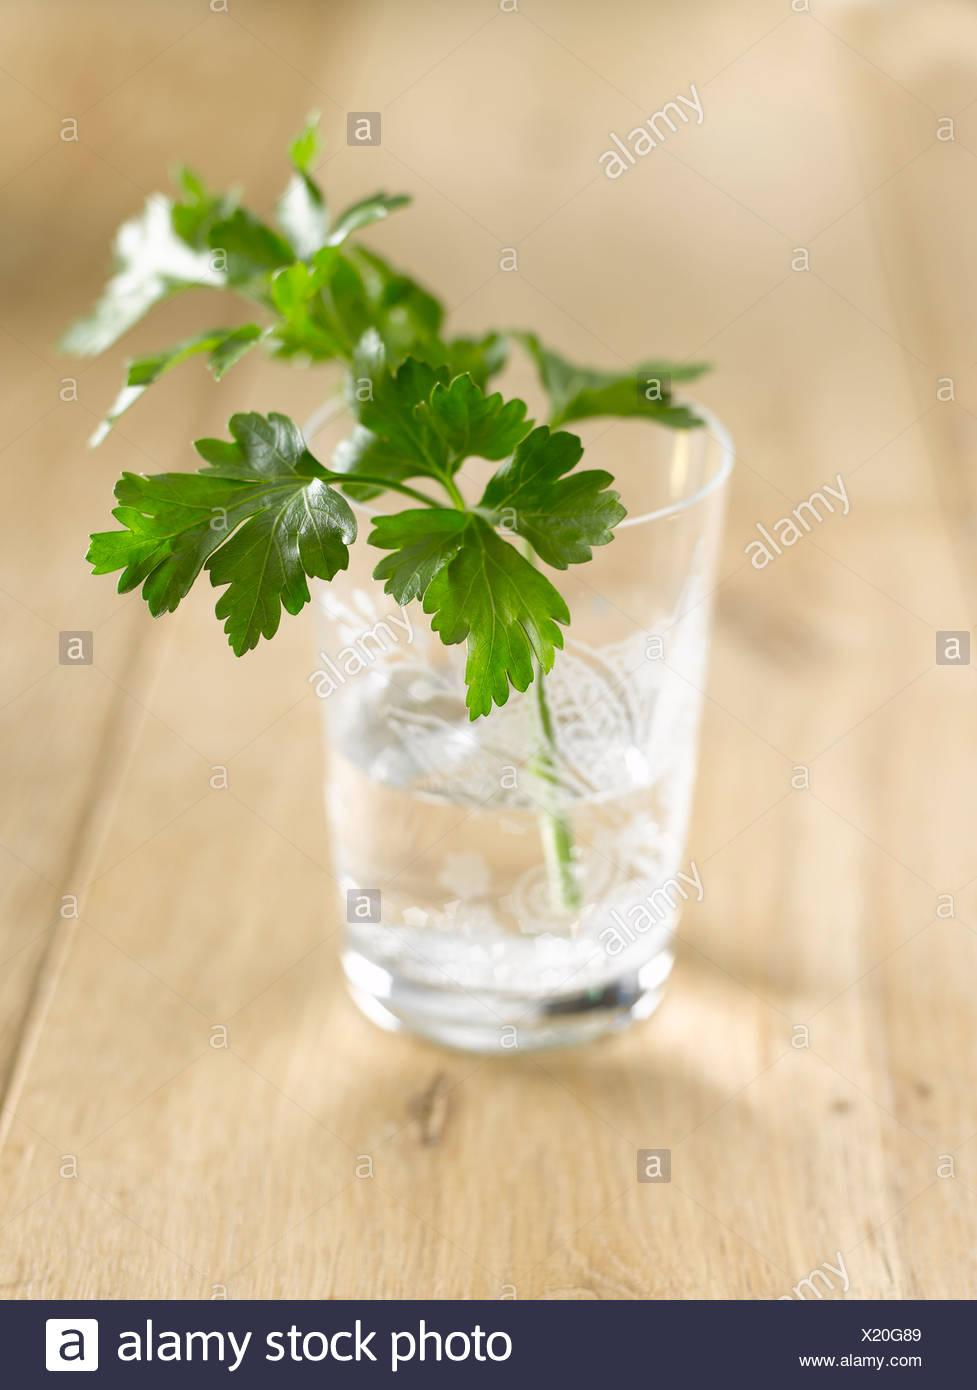 Dans l'eau de persil Petroselinum crispum (verre) Photo Stock